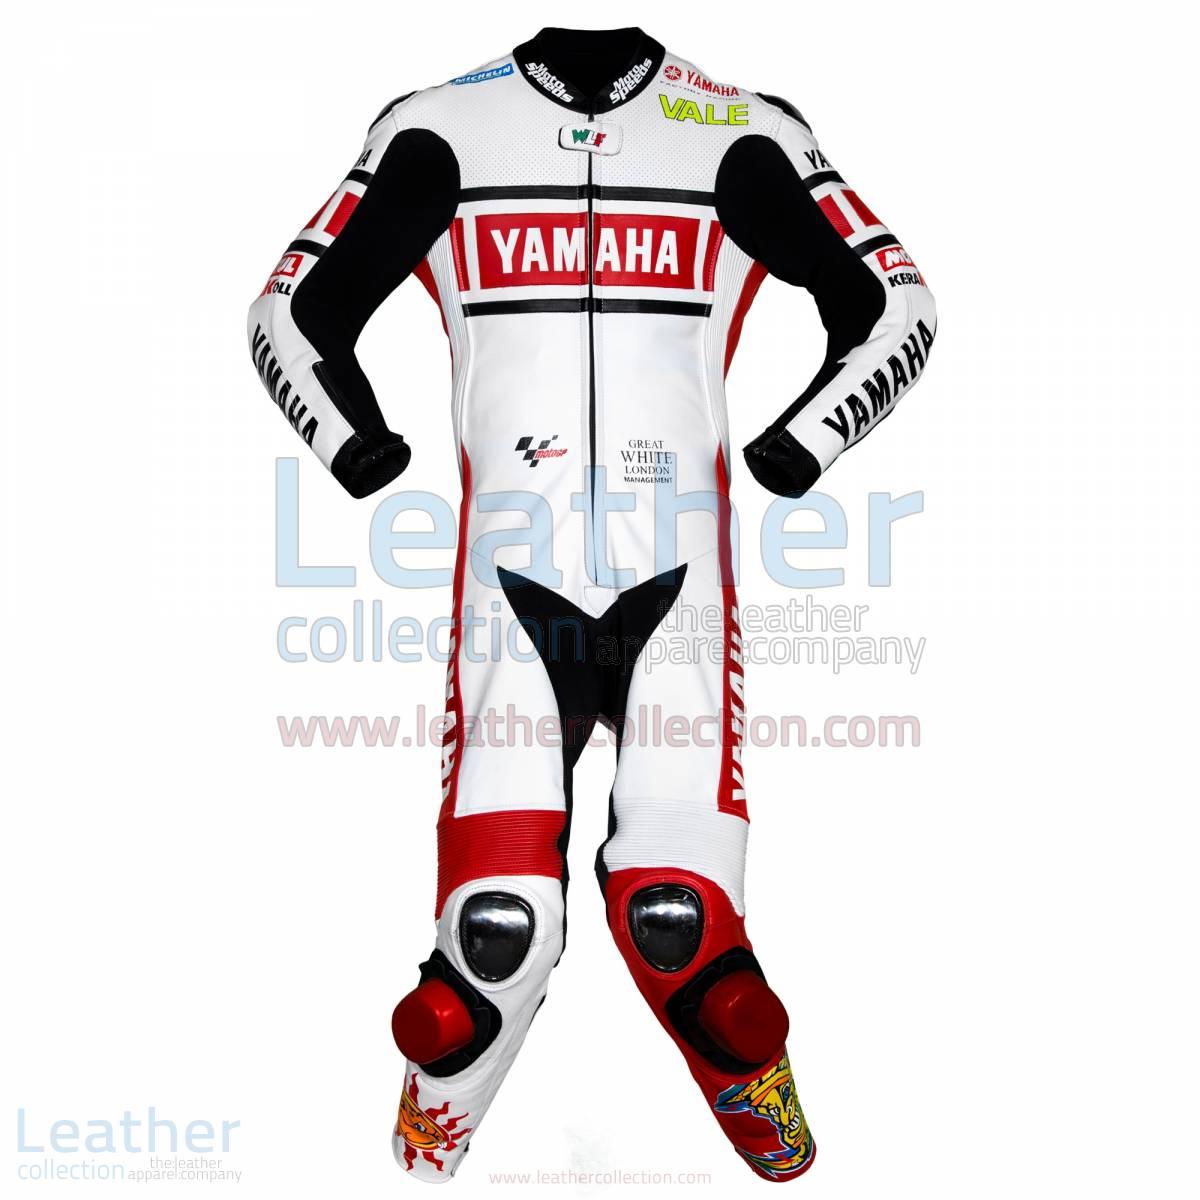 Valentino Rossi Yamaha MotoGP (Spain) 2005 Leathers